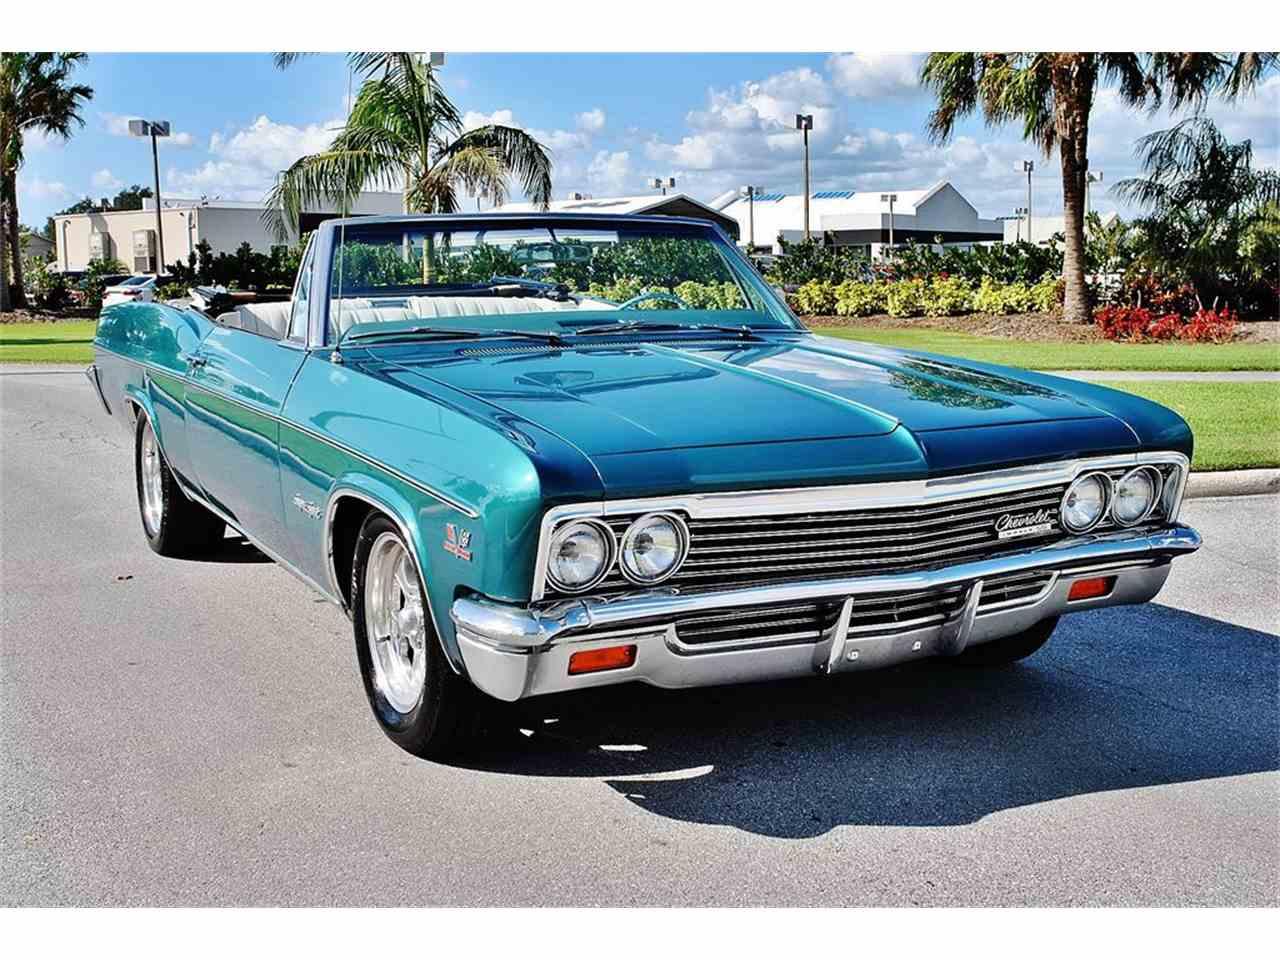 Impala 1966 chevrolet impala : 1966 Chevrolet Impala for Sale   ClassicCars.com   CC-1031009